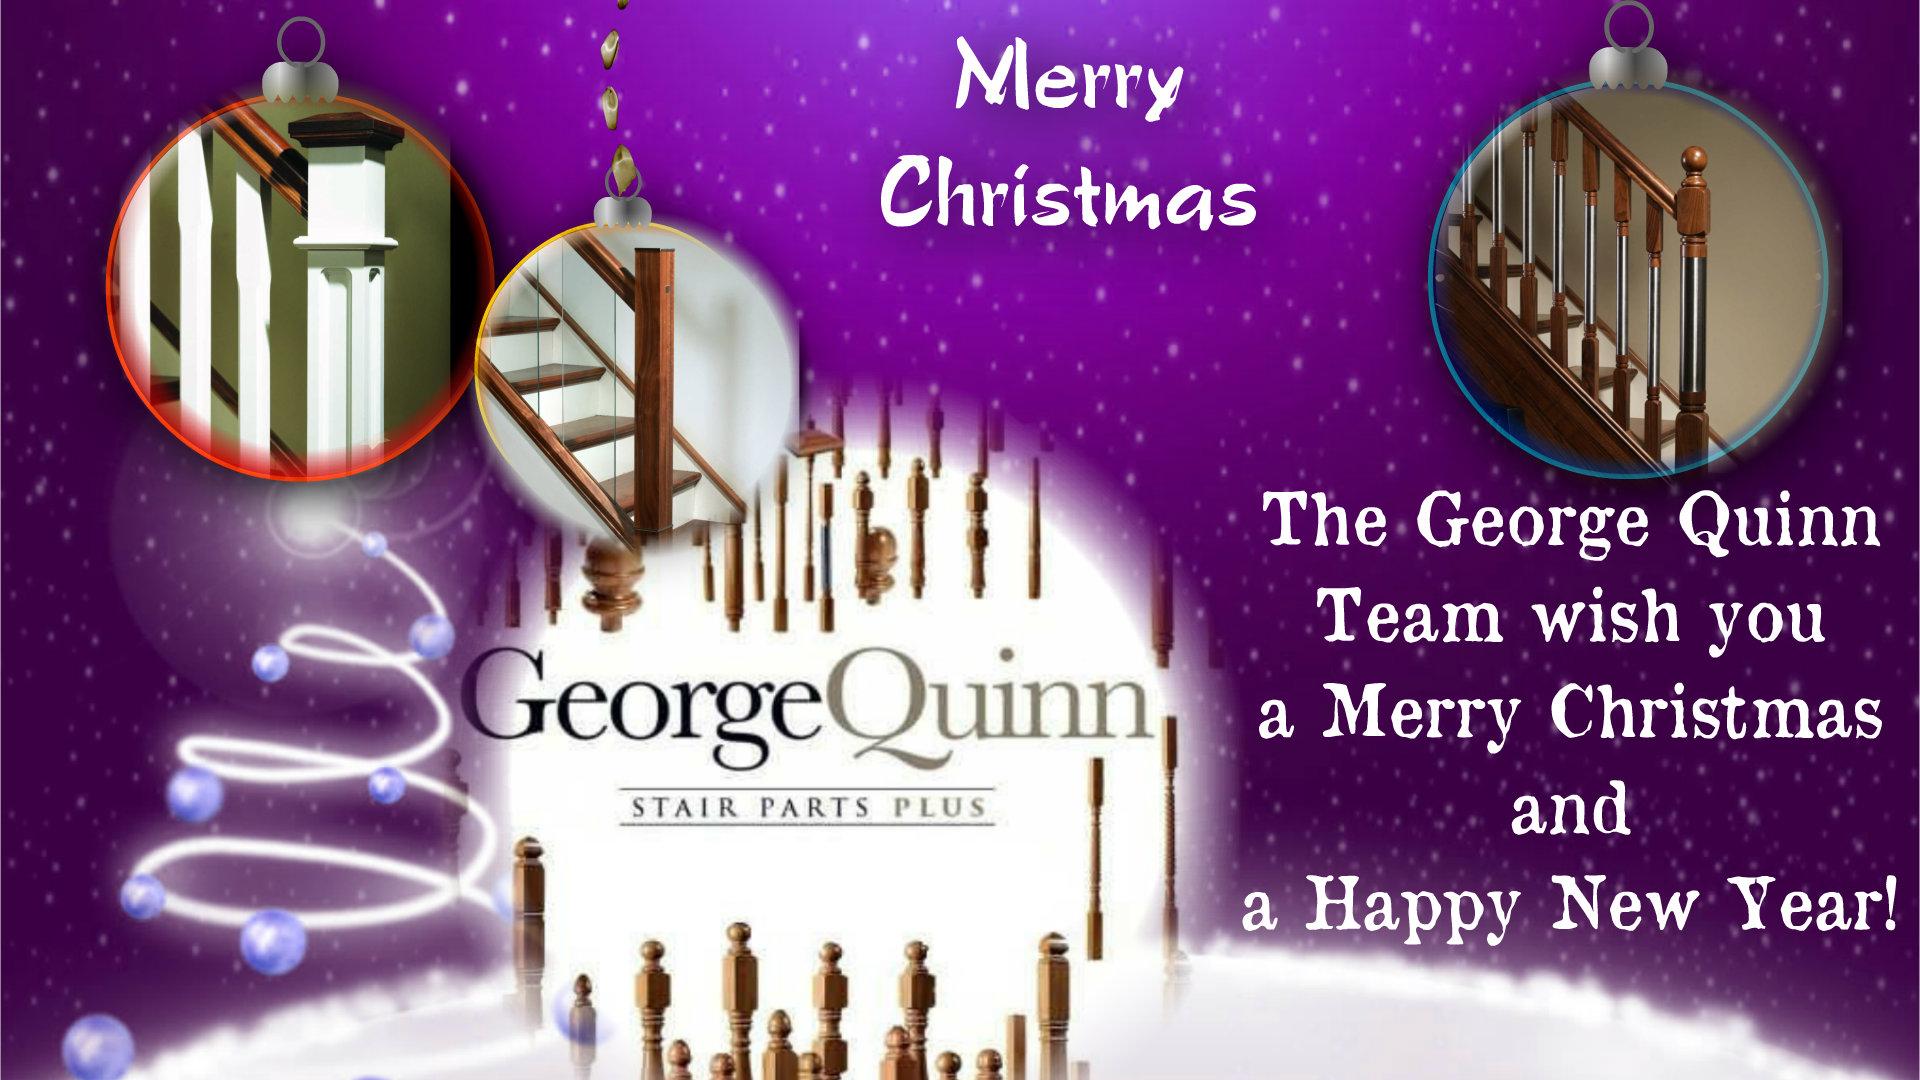 George Quinn Stair Parts Plus - Christmas Holidays 2017